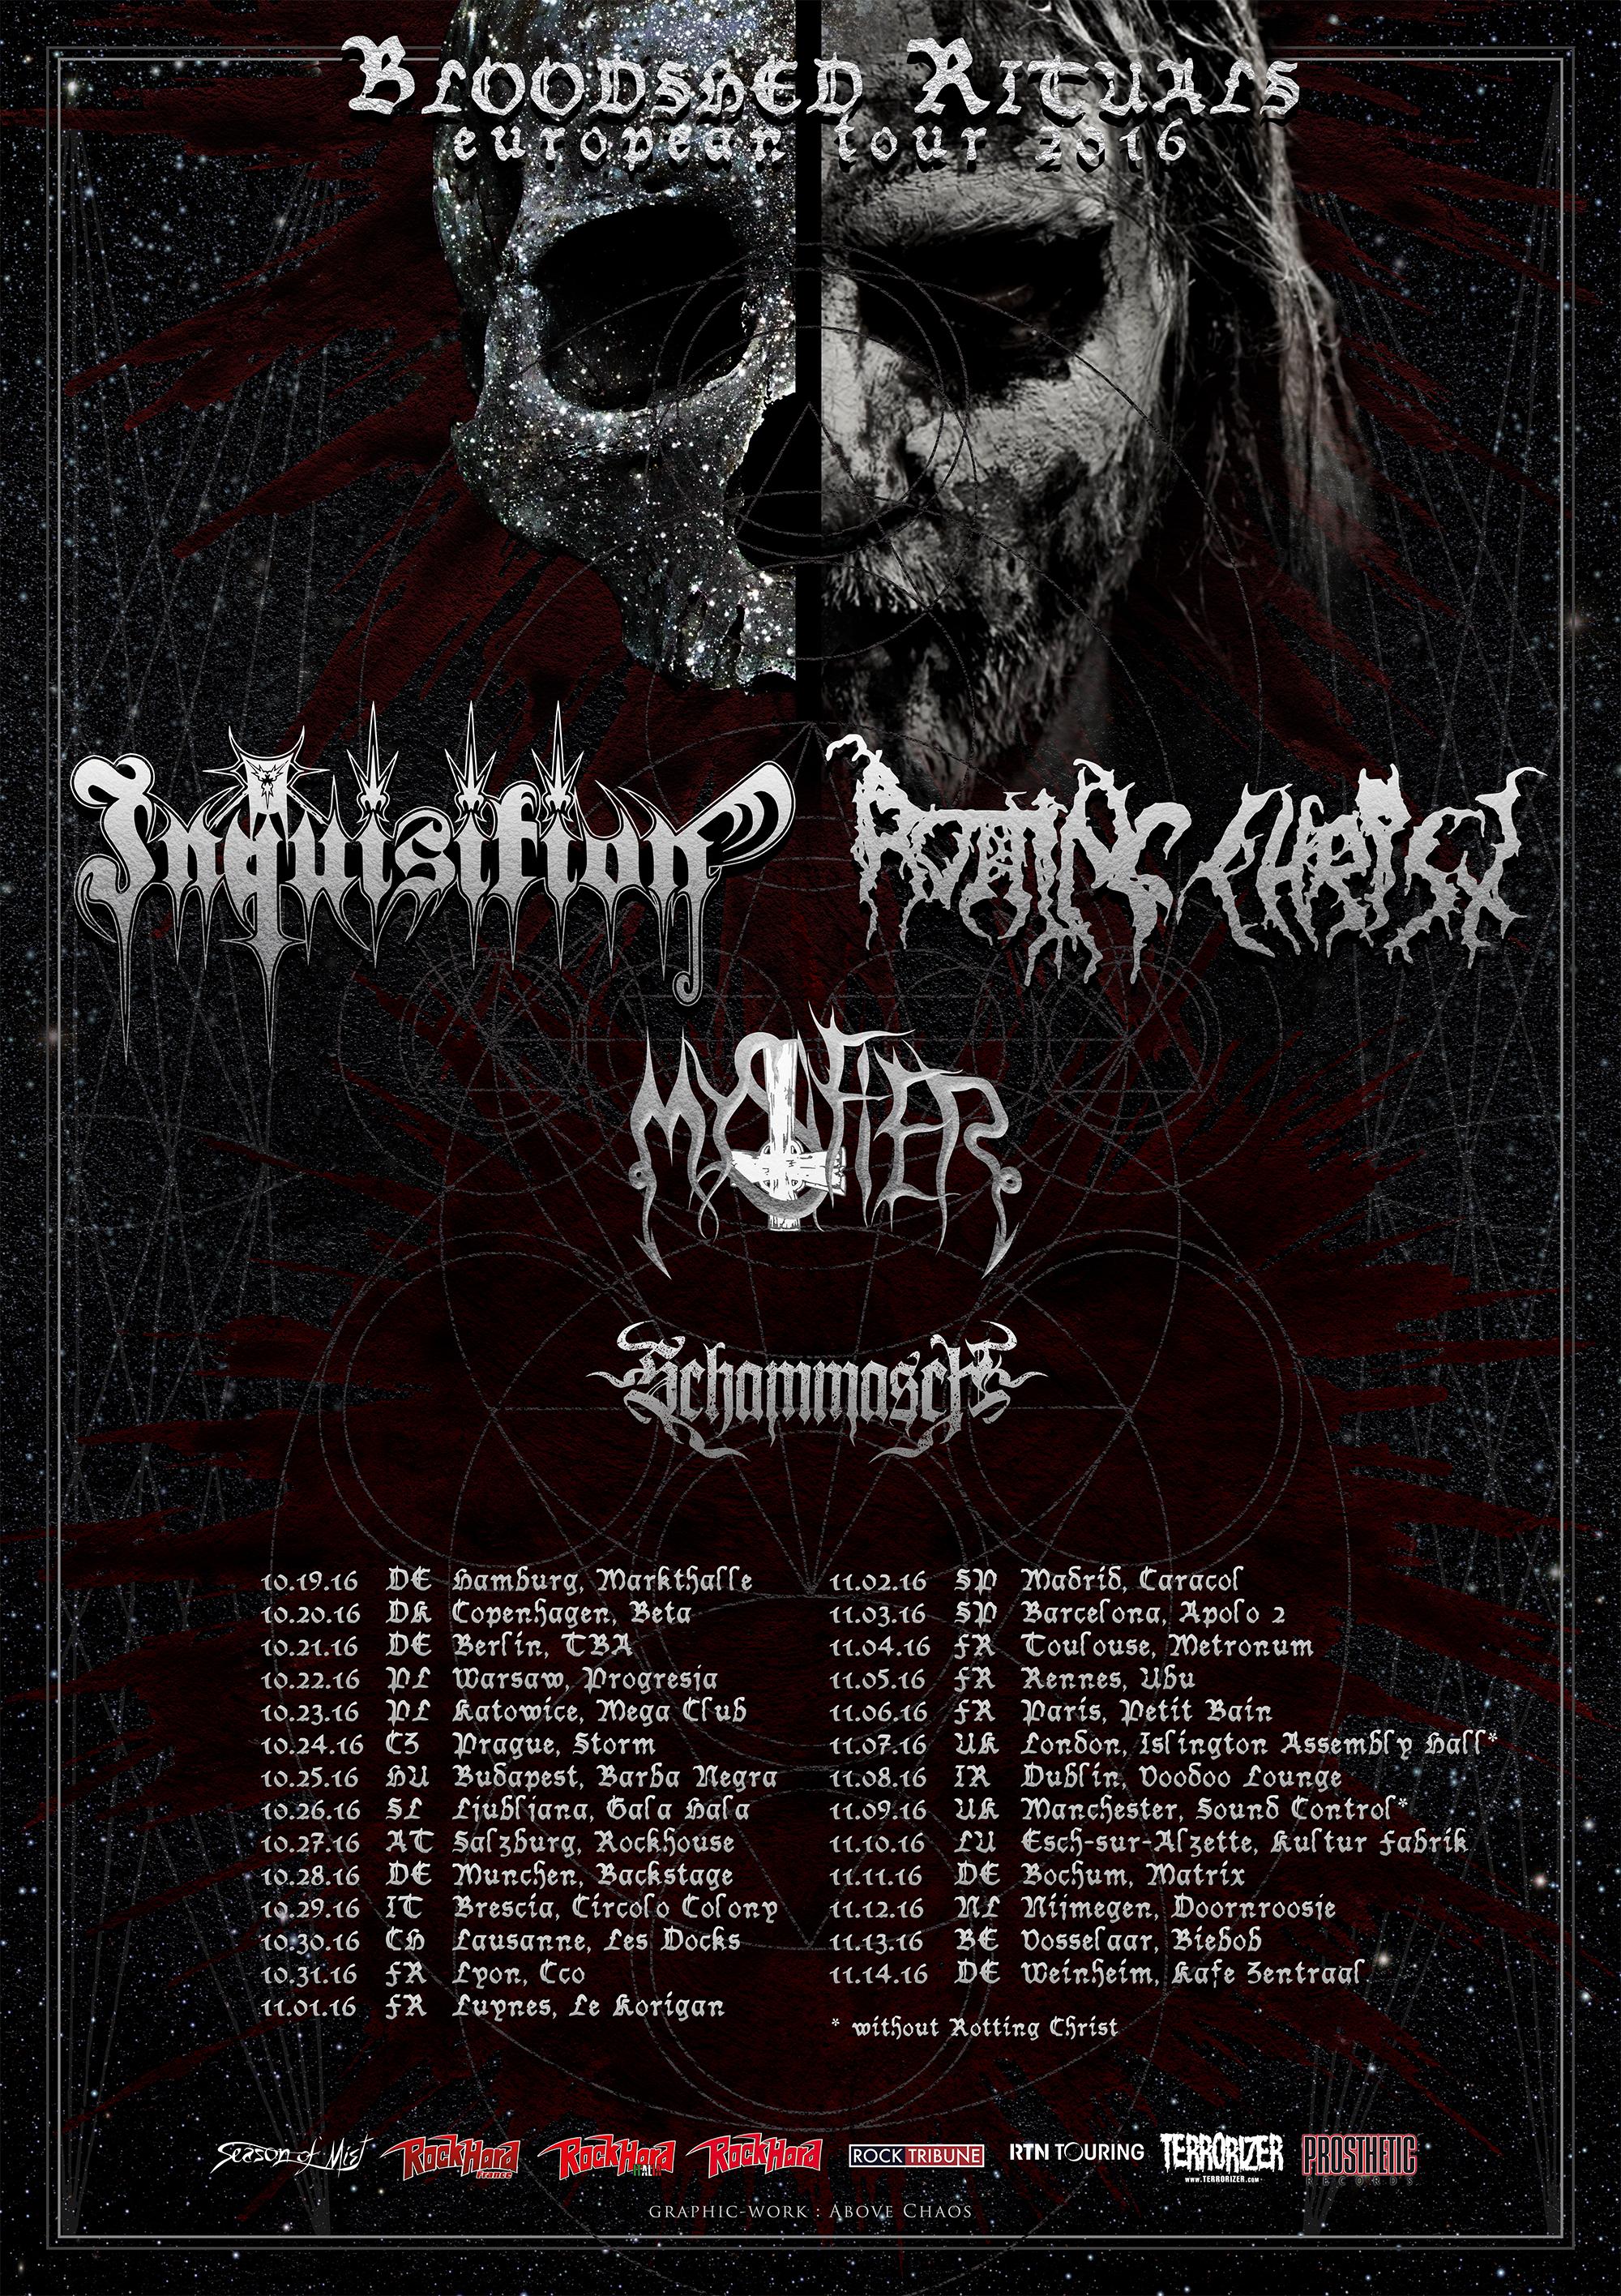 Rotting Christ & Inquisition - EU Tour 2016 - Bloodshed Rituals